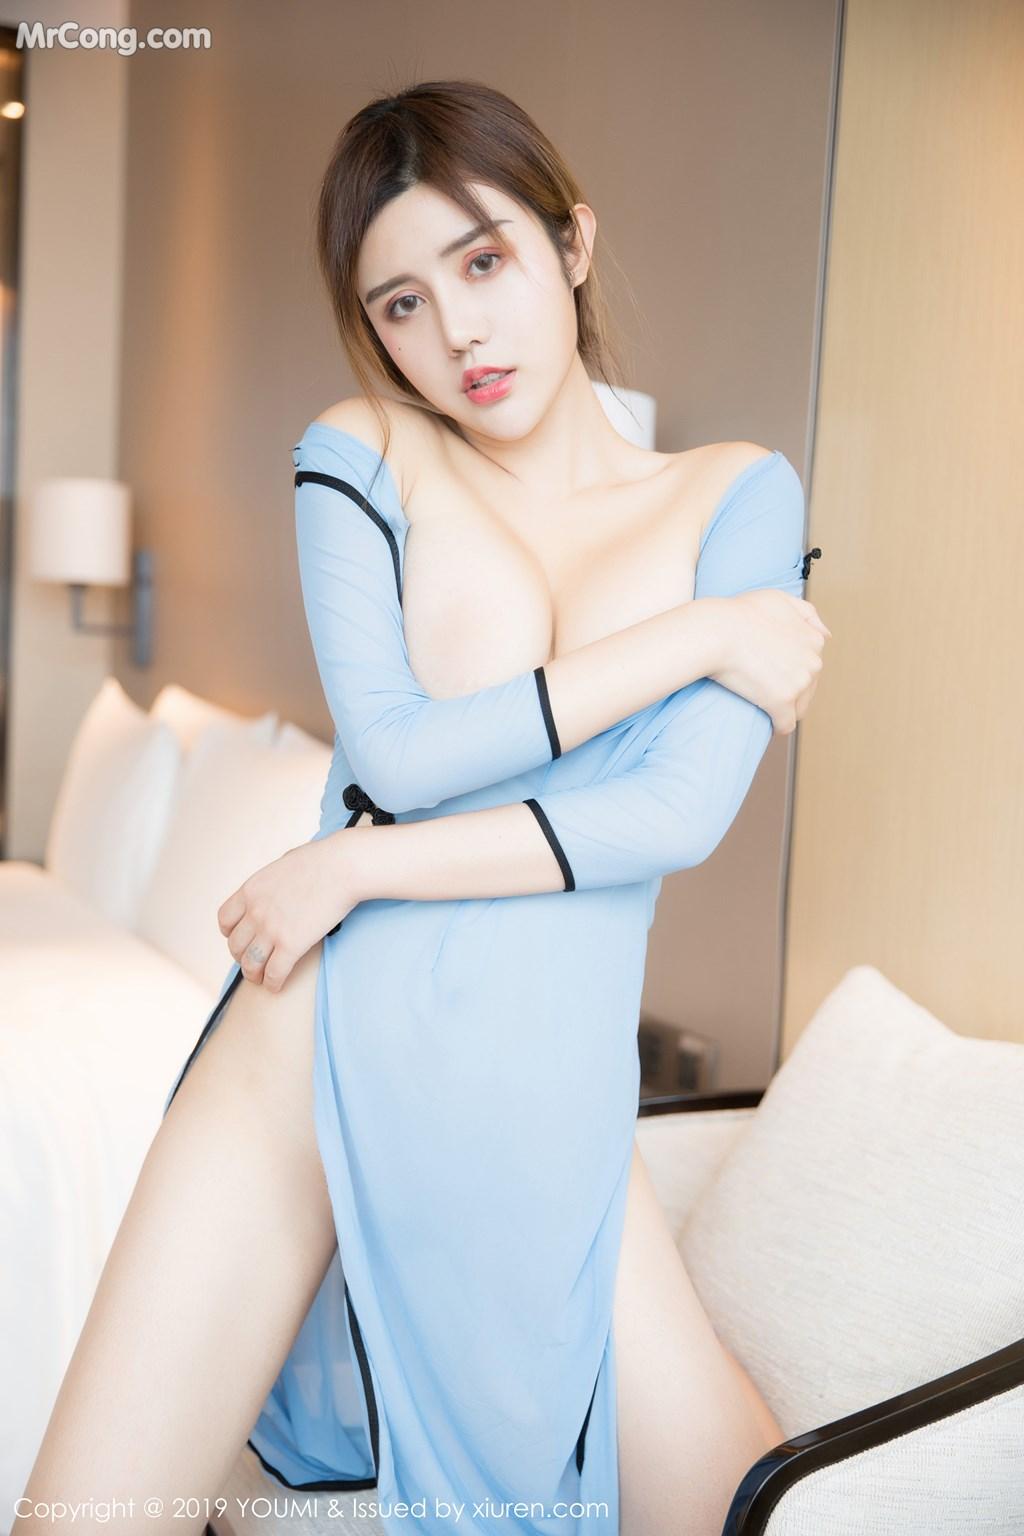 YouMi Vol.353: Cris_卓娅祺 (51P)